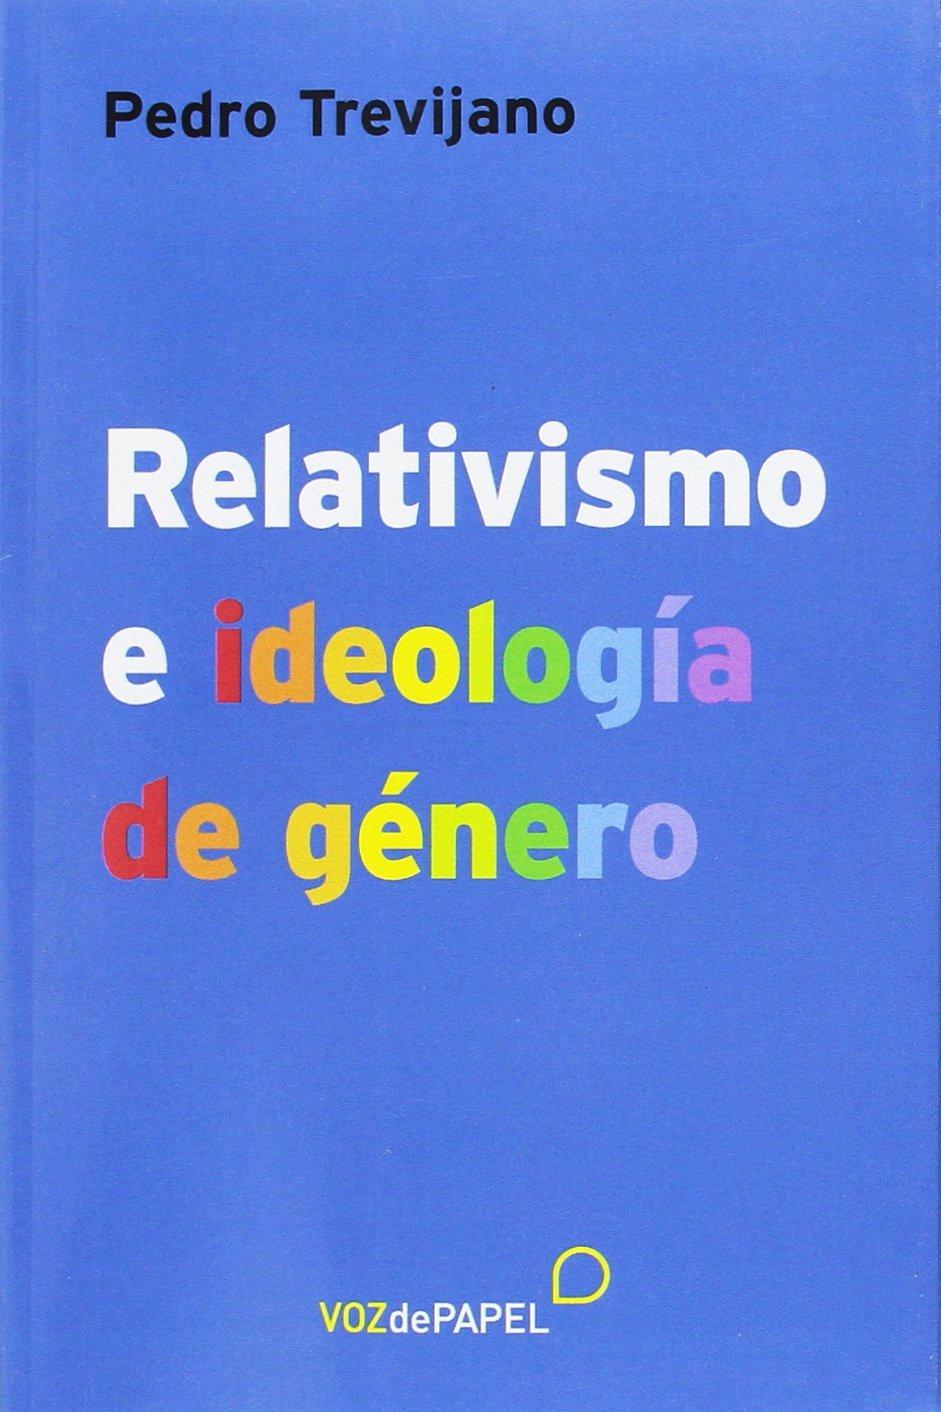 Relativismo e ideología de género: Amazon.es: Pedro Trevijano: Libros